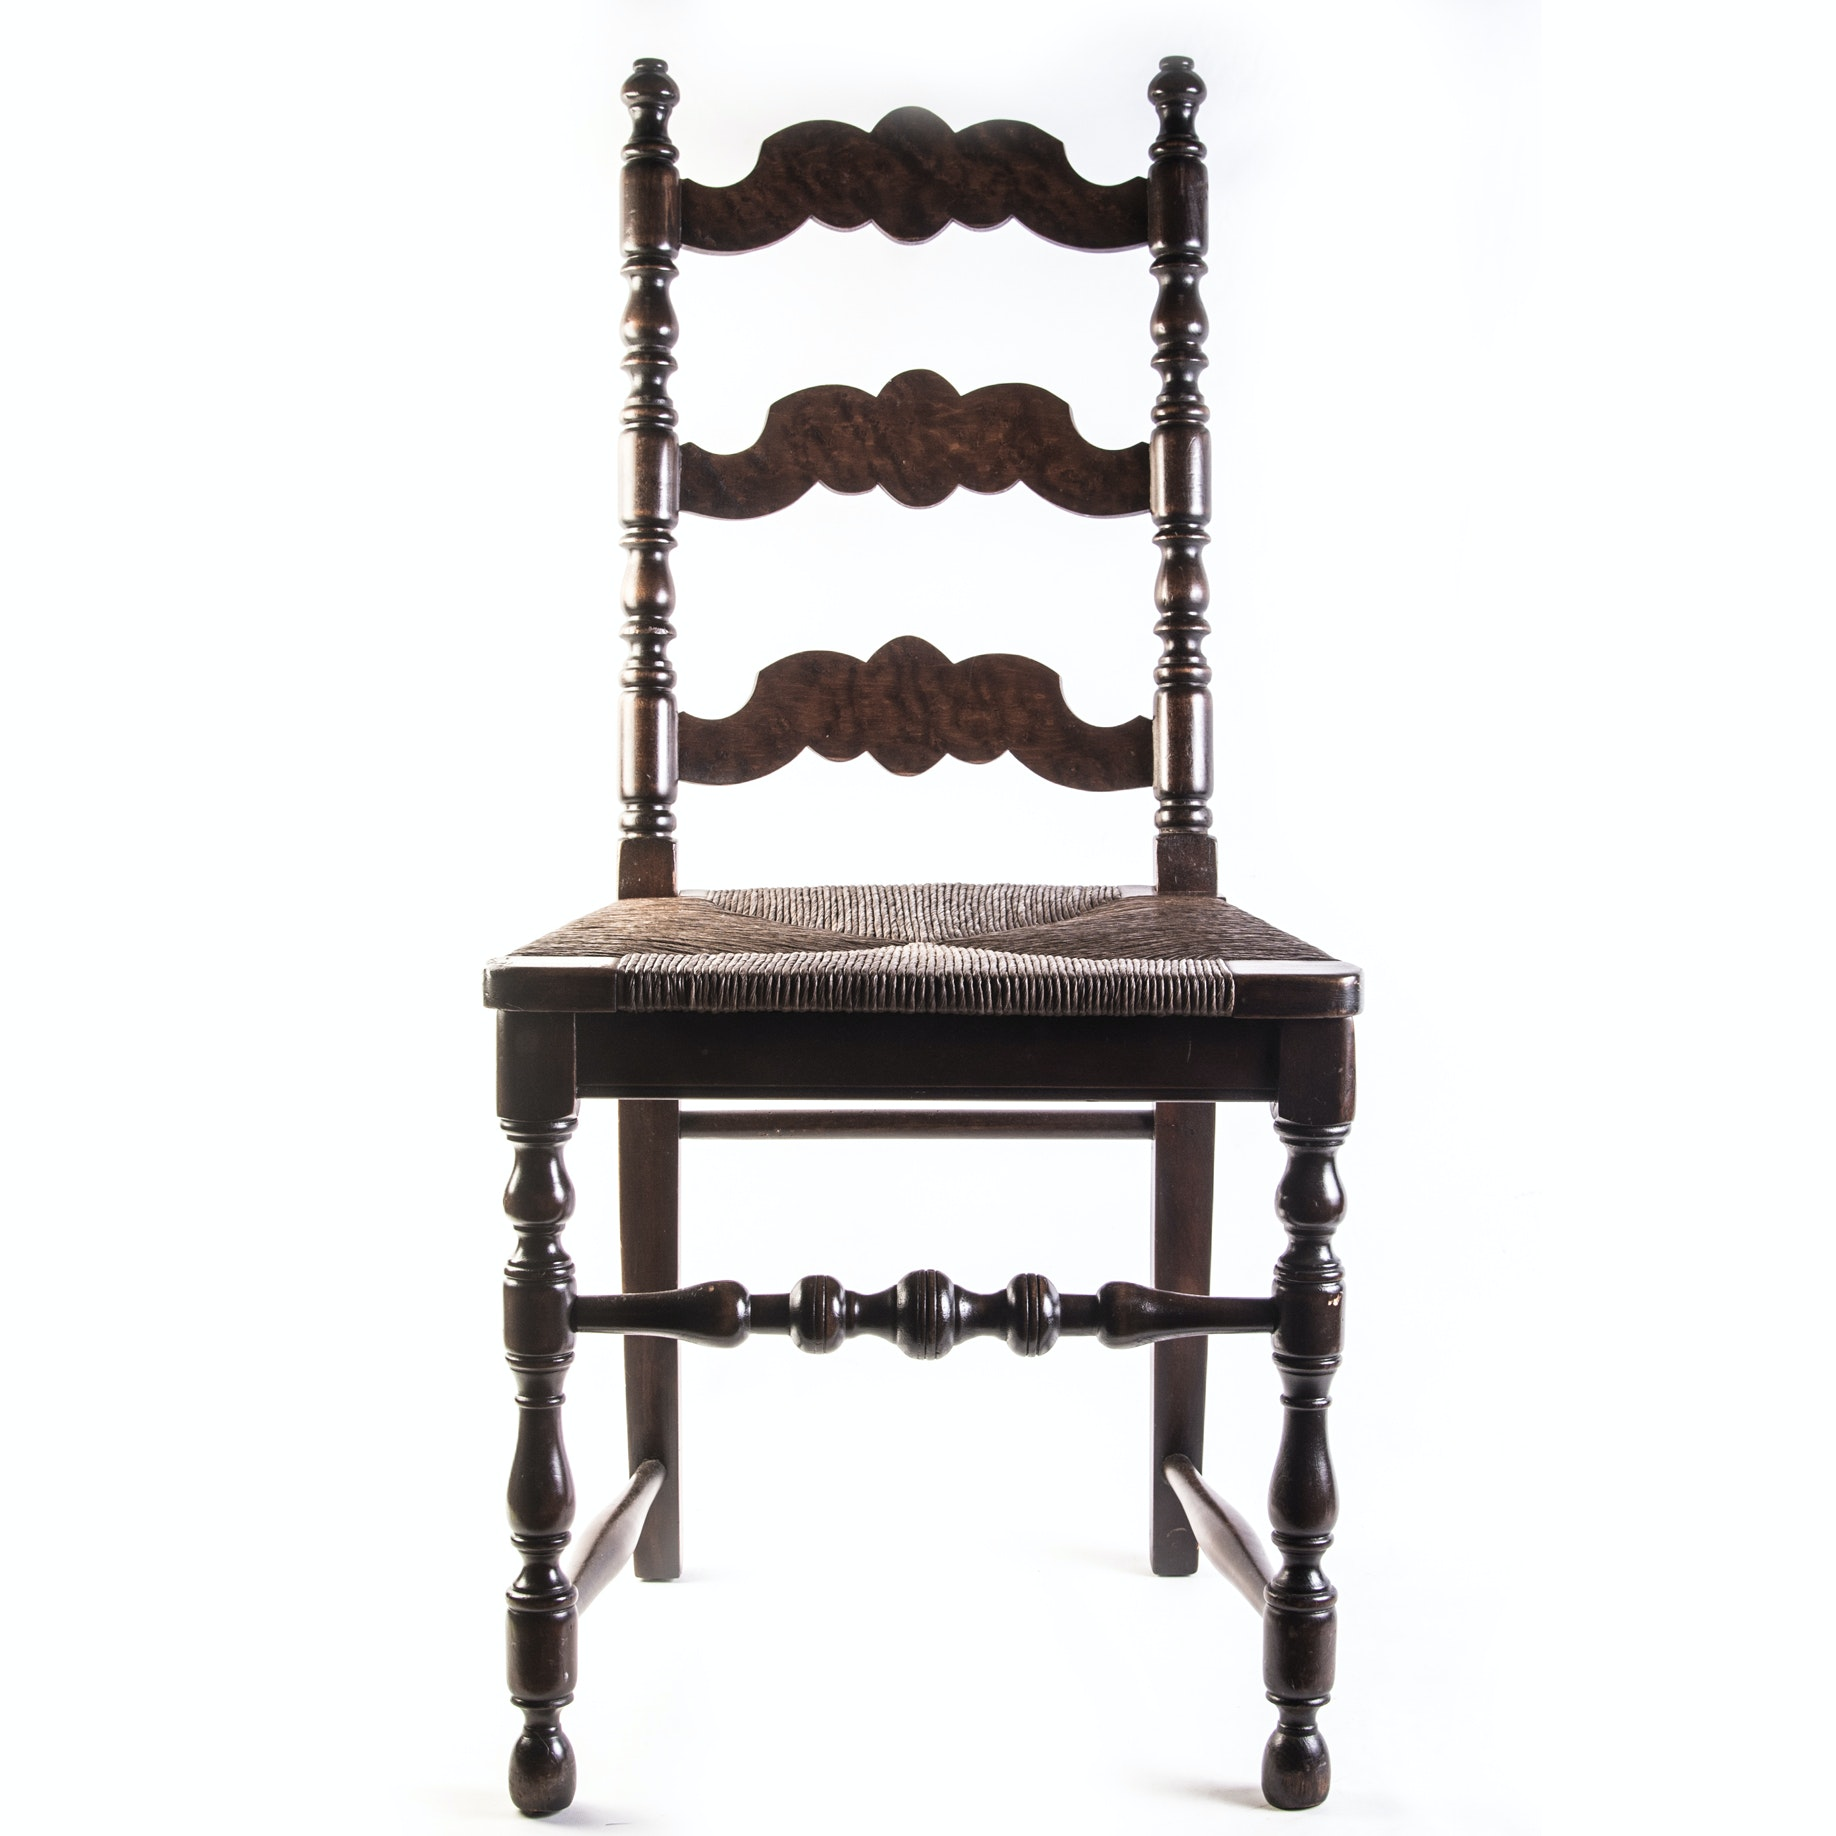 Vintage Ladderback Chair